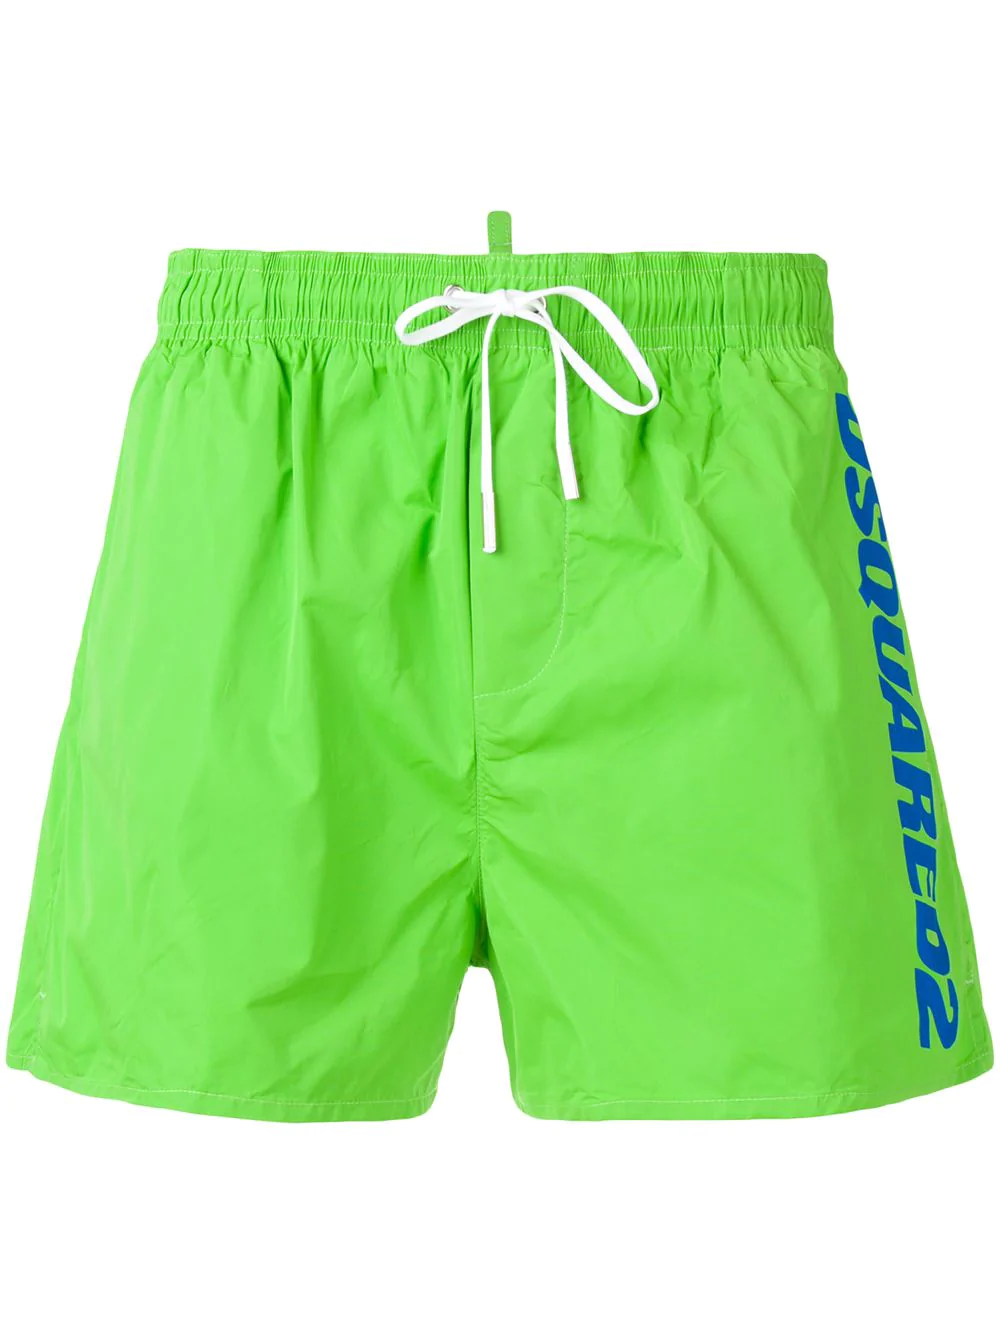 3dade47e6b Dsquared2 Green Swim Shorts In Technical Fabric   ModeSens